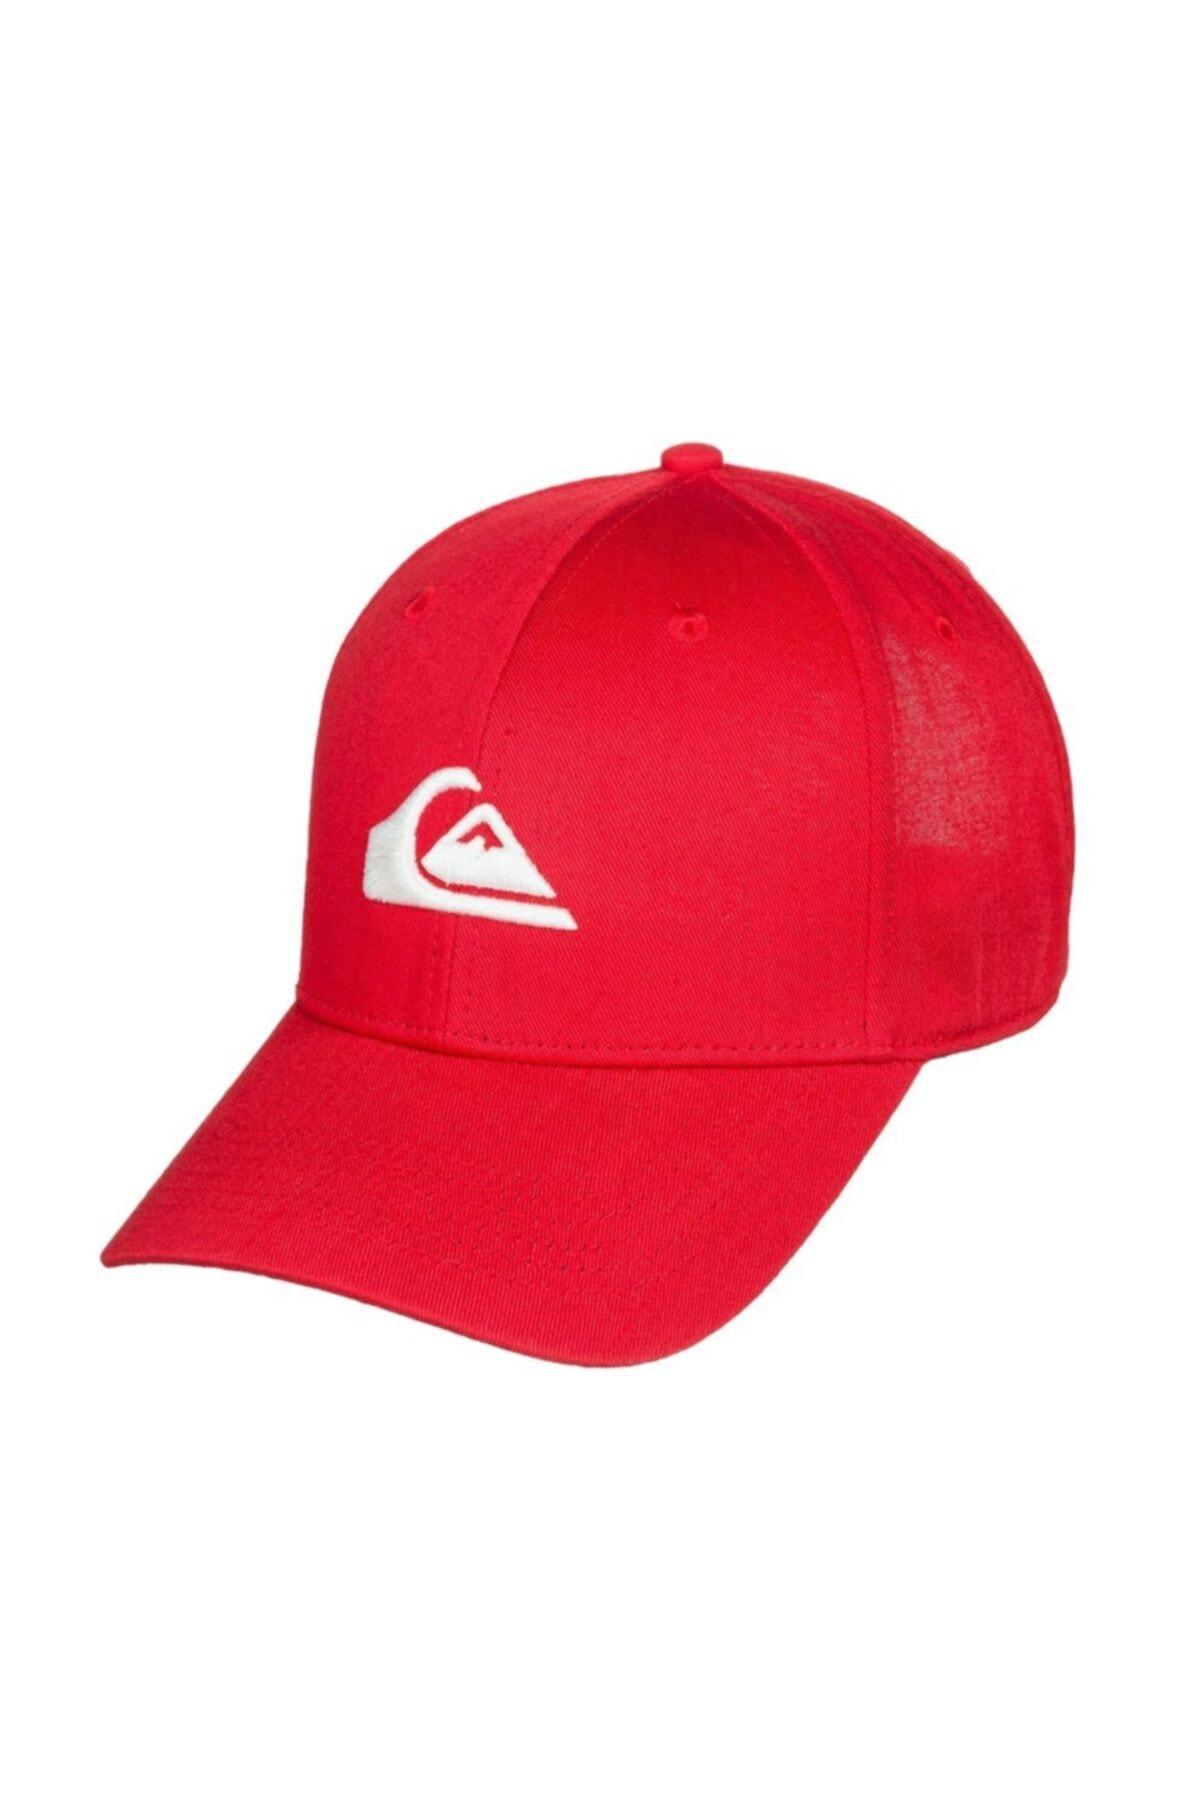 Quiksilver Decades Snapback Hdwr Mnl0 Şapka 1